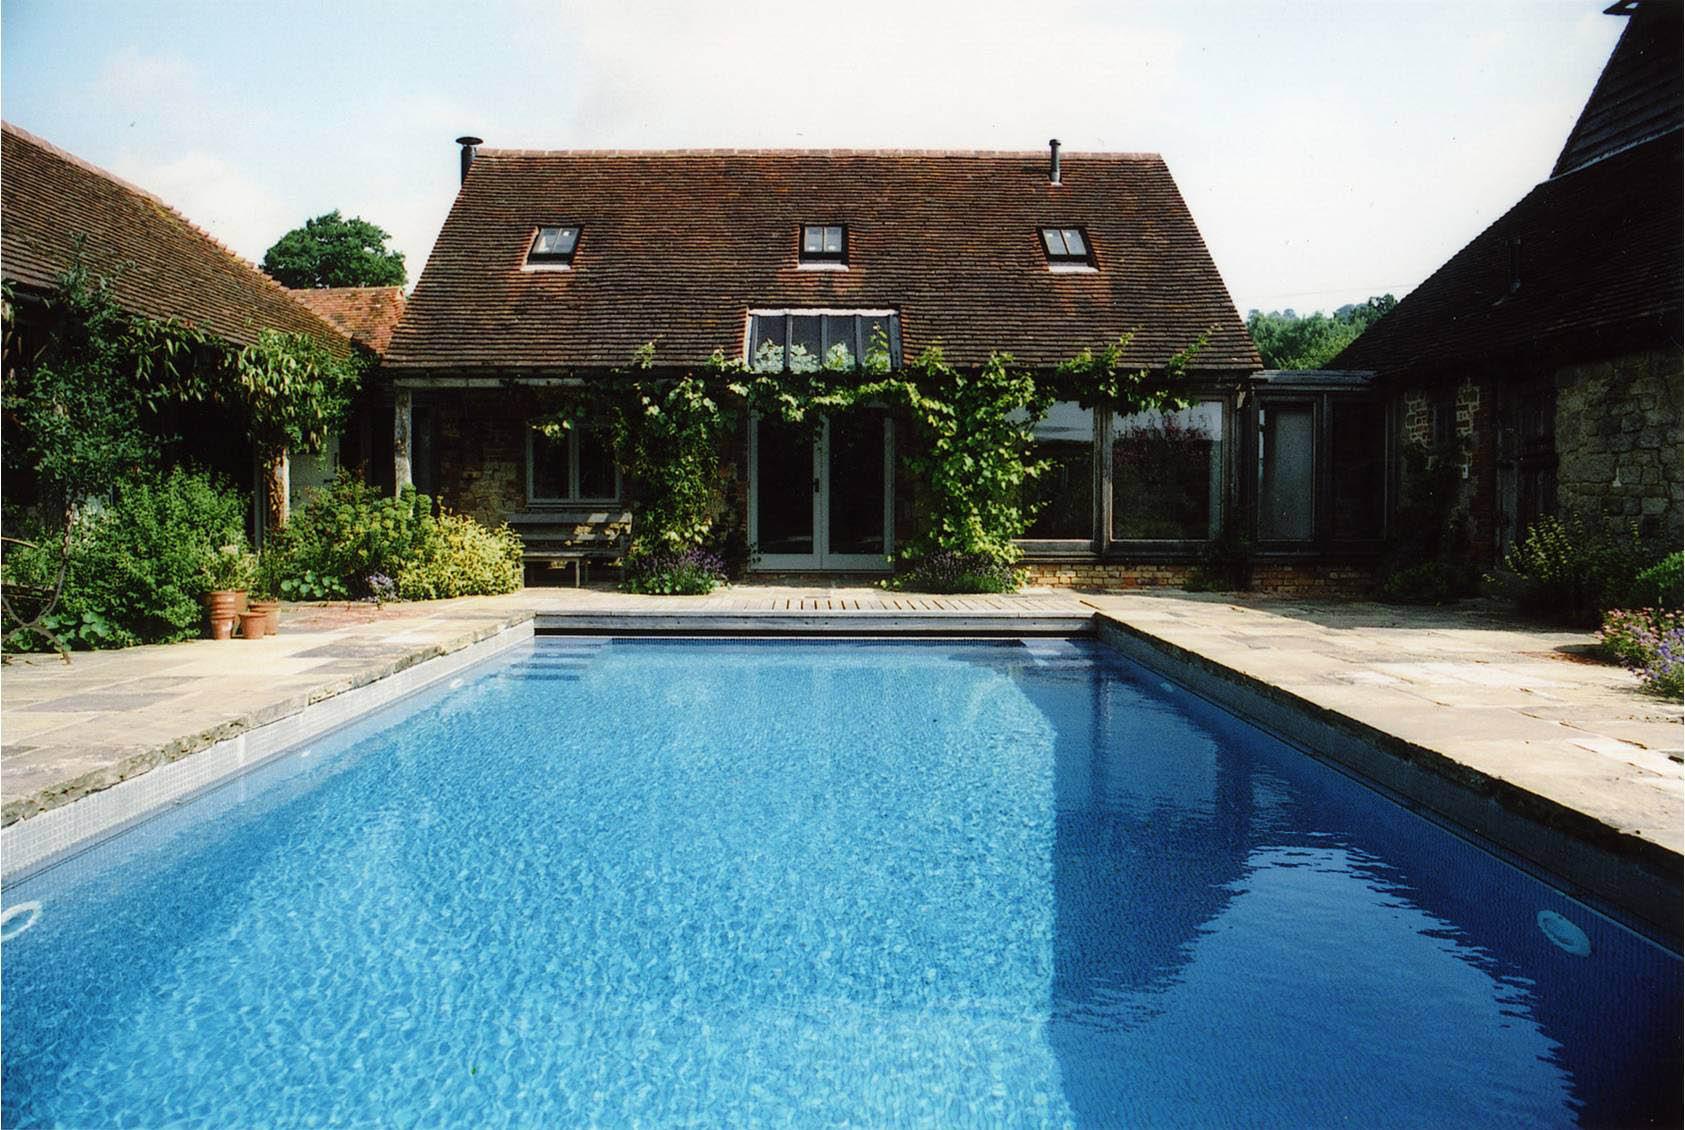 cancun pools fun classic home swimming pool design home